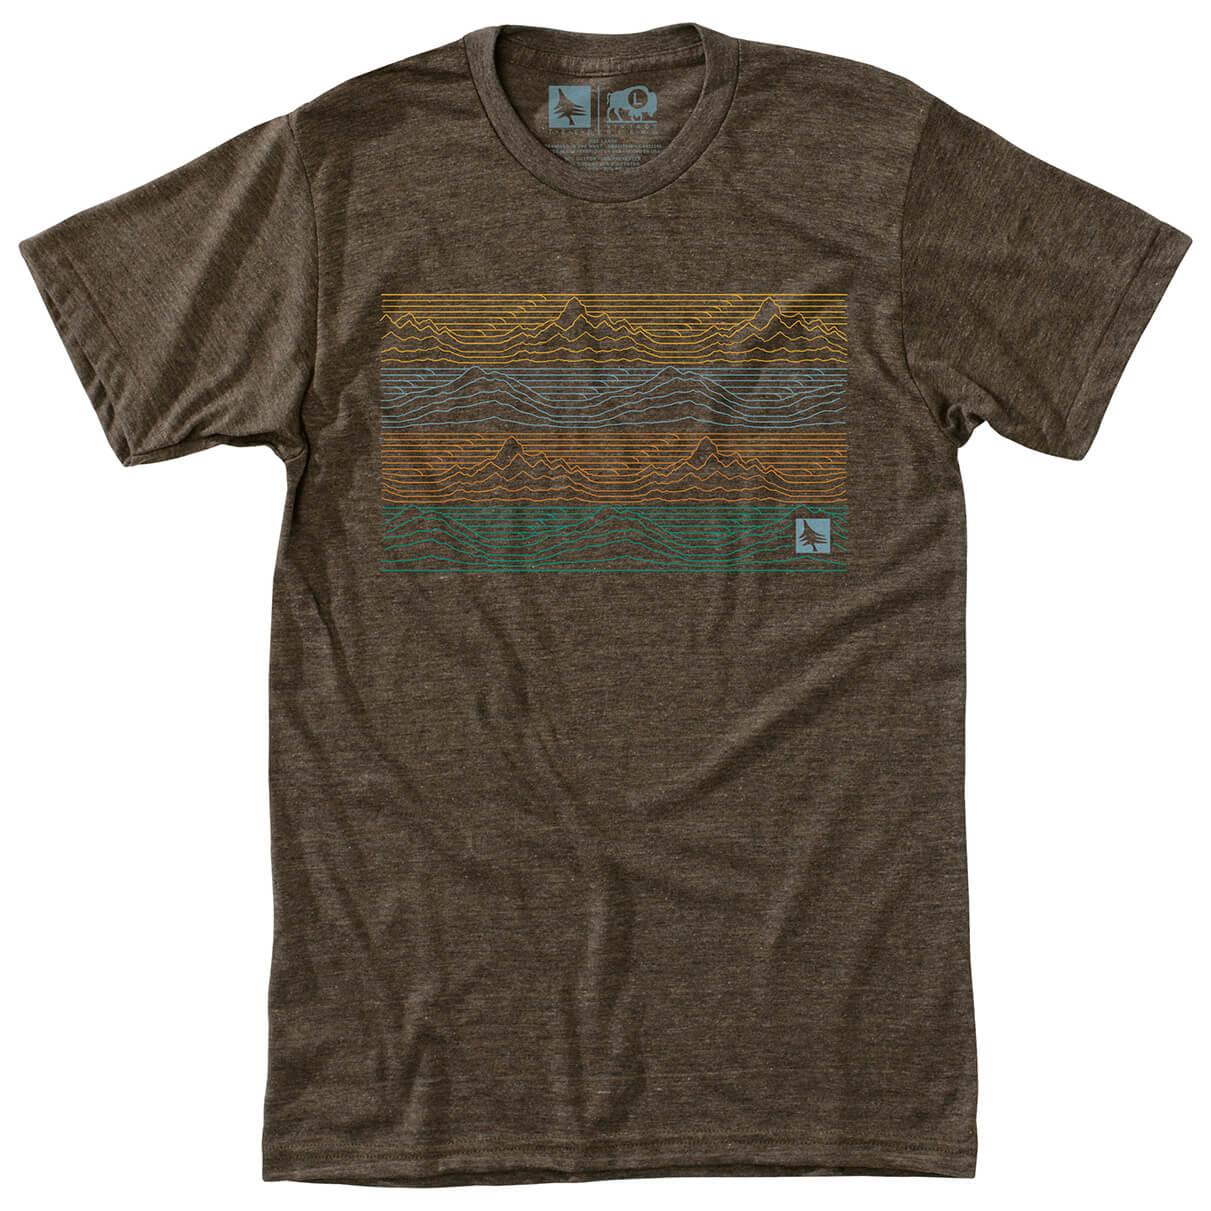 Hippy tree gradient tee t shirt homme achat en ligne for Hippie t shirts australia